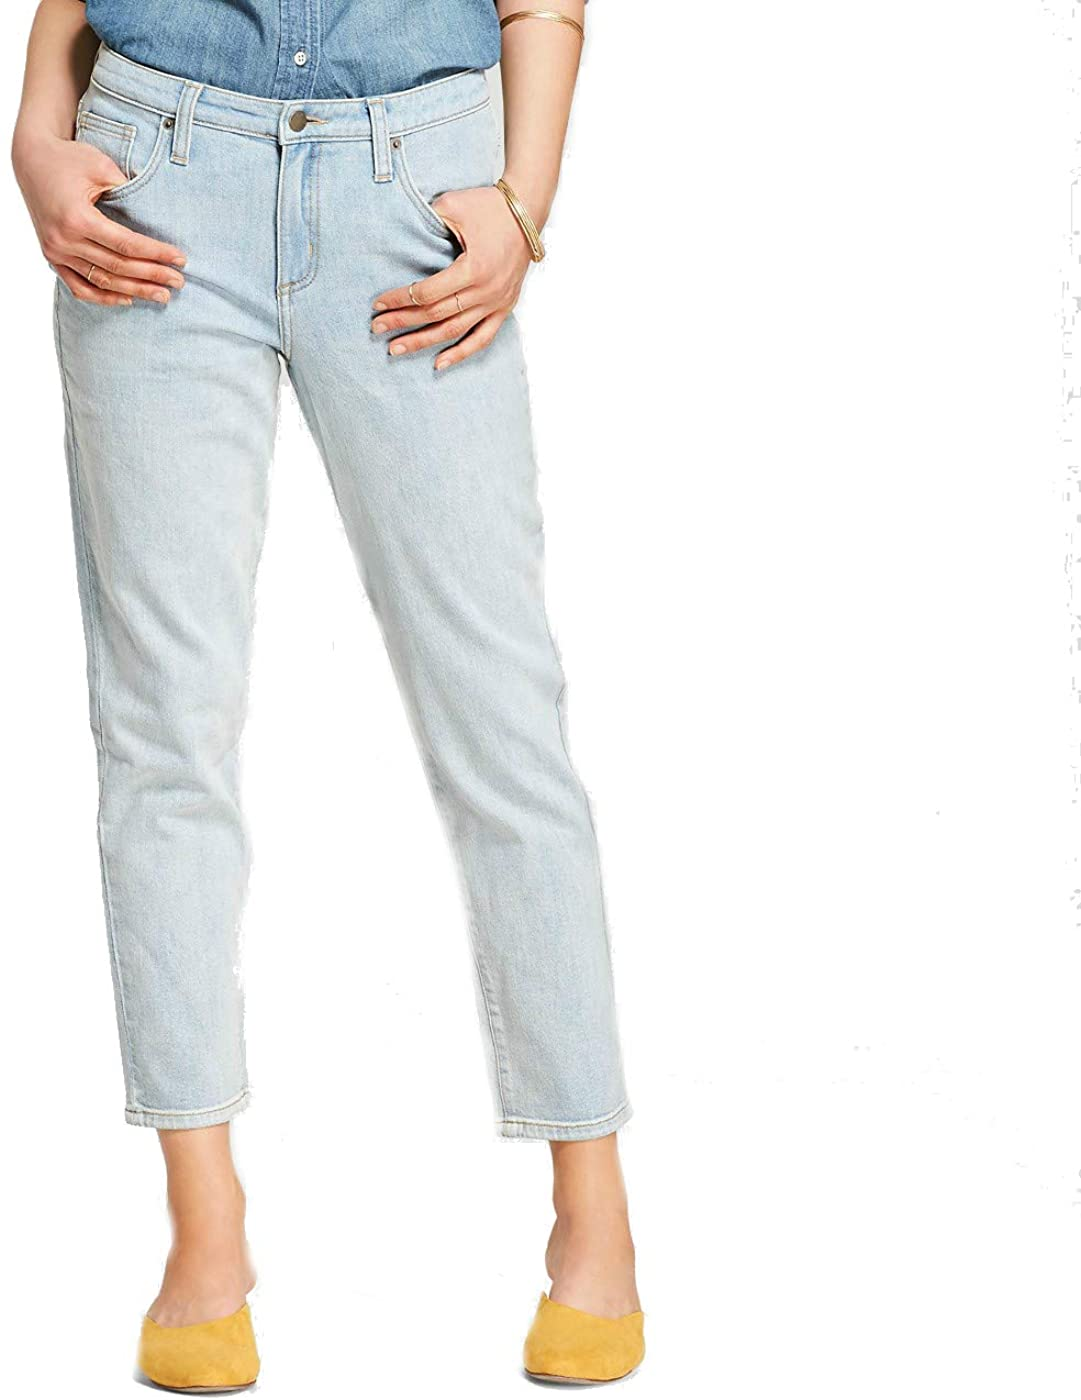 Universal Thread Women's High-Rise Straight Jeans Light Wash, Blue